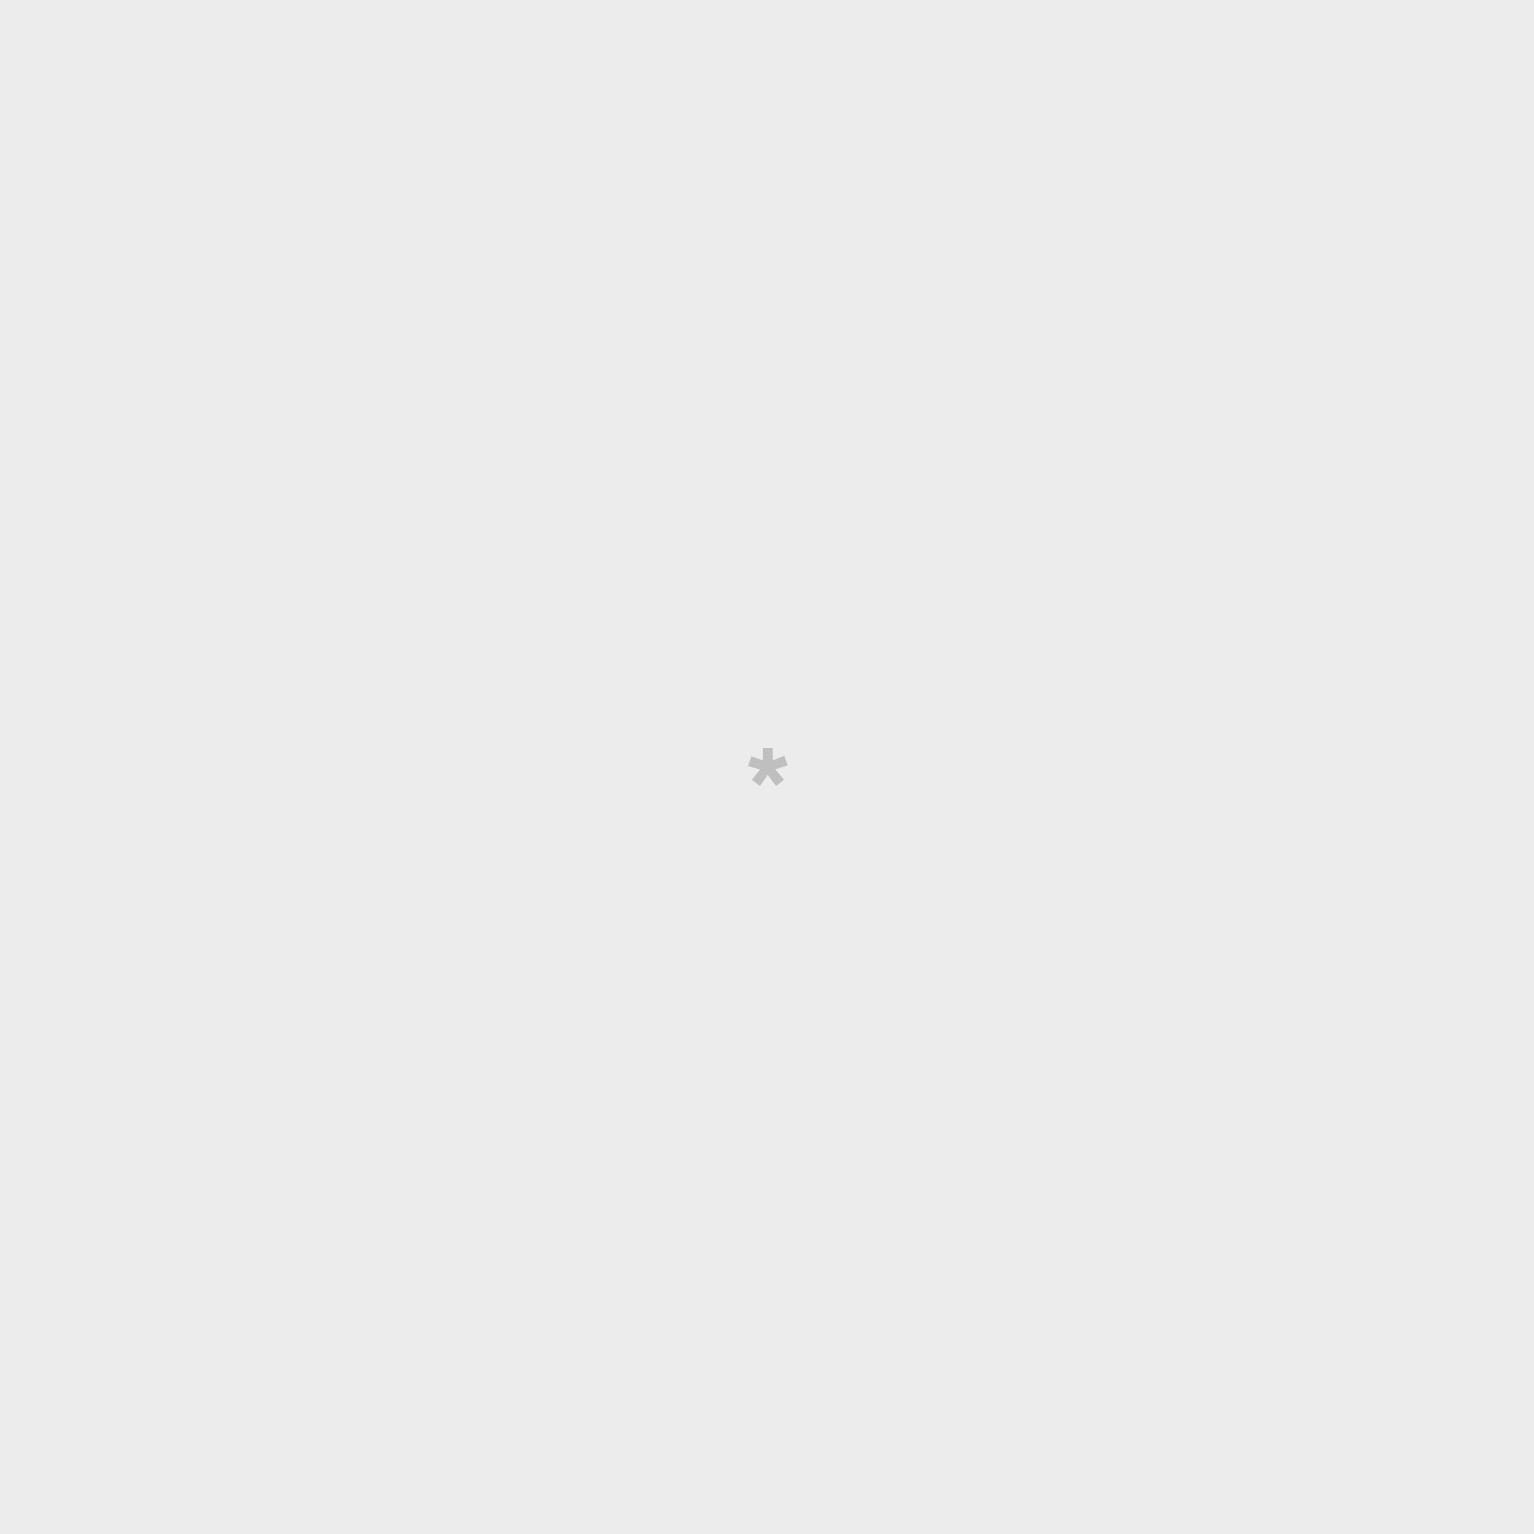 16 GB USB stick – Vanilla ice cream